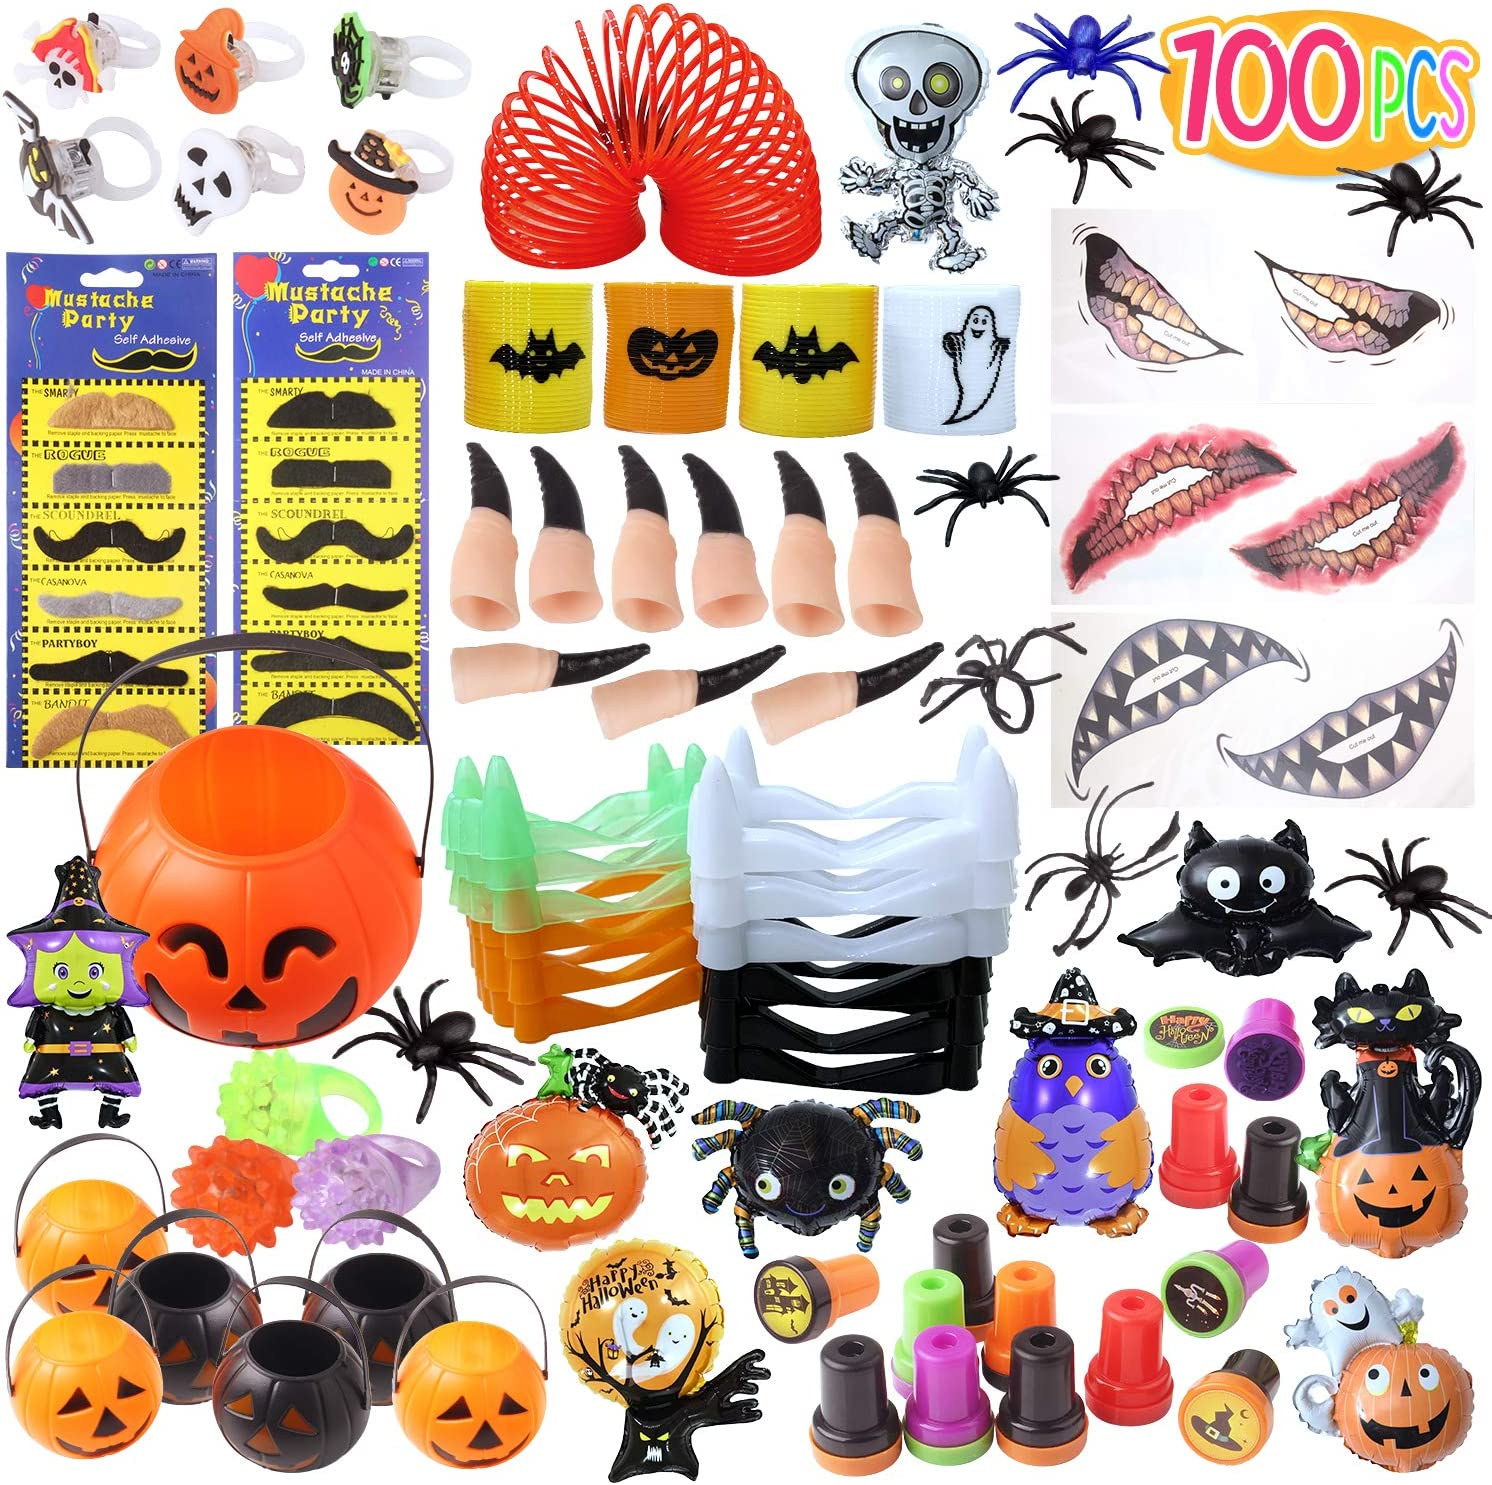 PITAYA Juguetes de Halloween,Suministros para Juguetes de Fiesta de Halloween, Bolsa de Regalo de Juguete de Halloween Trick or Treat